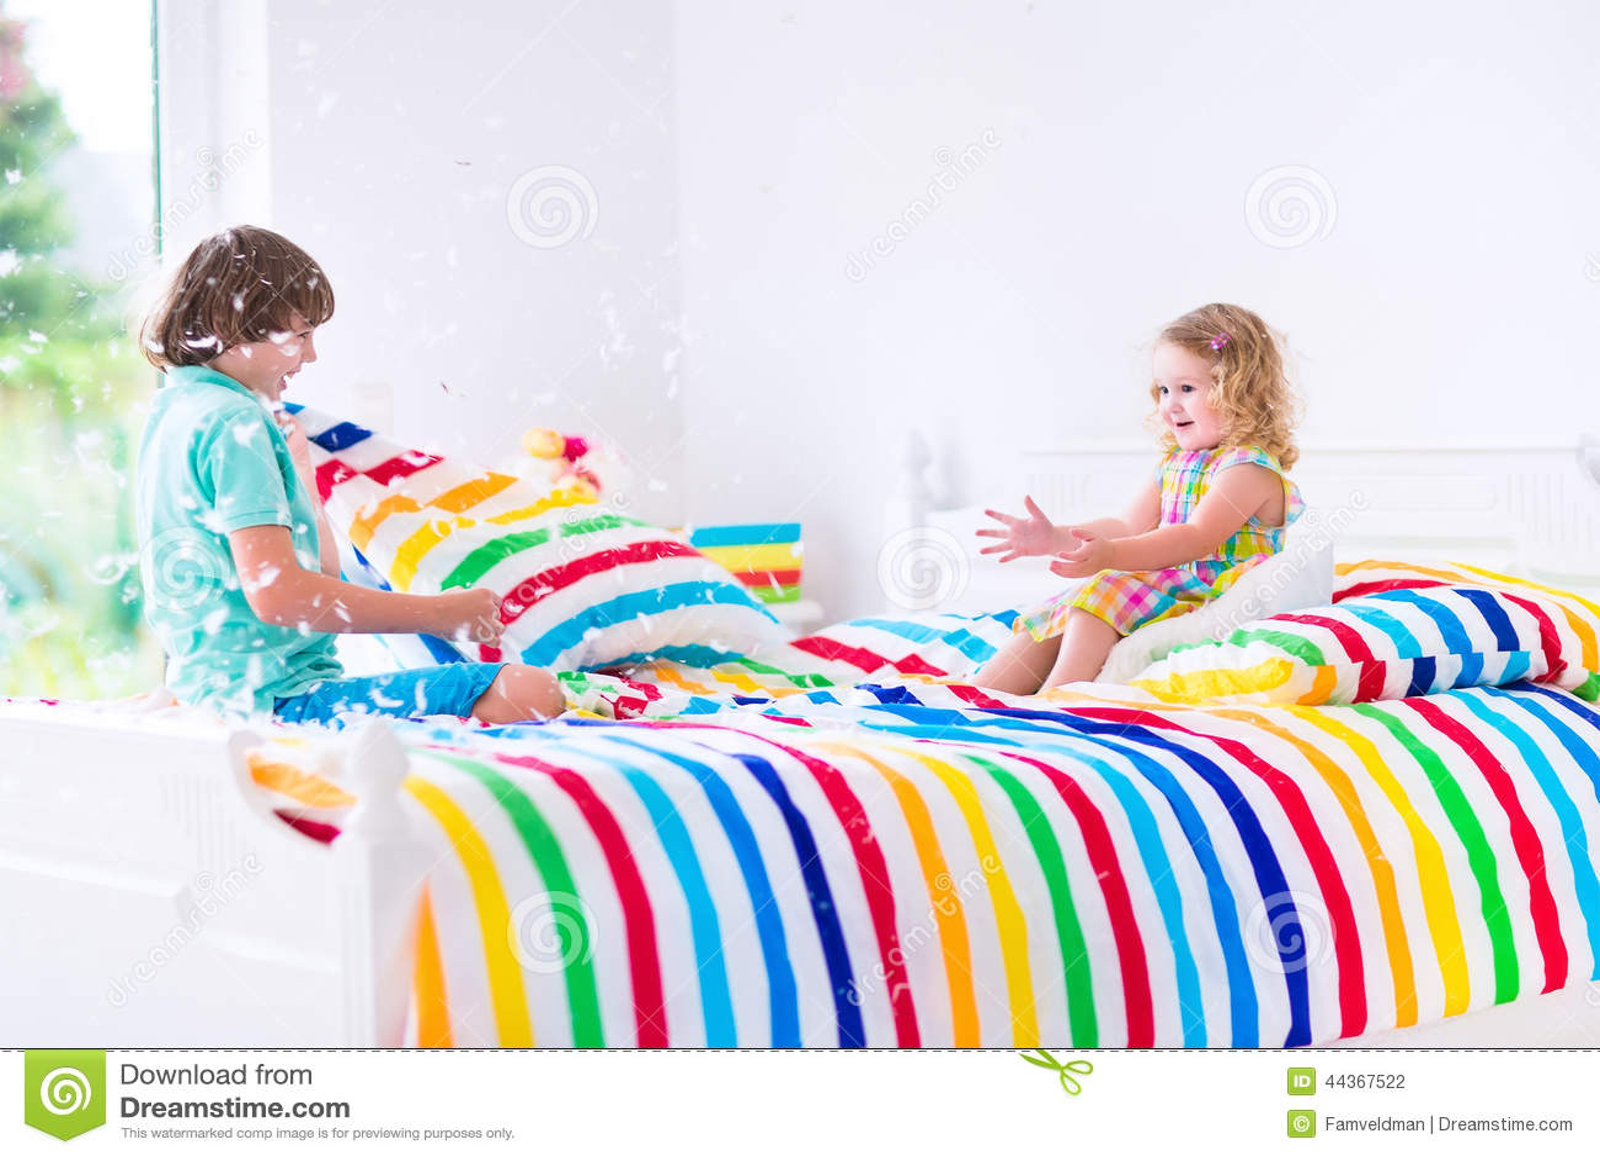 Kids Having Pillow Fight Indoors Little